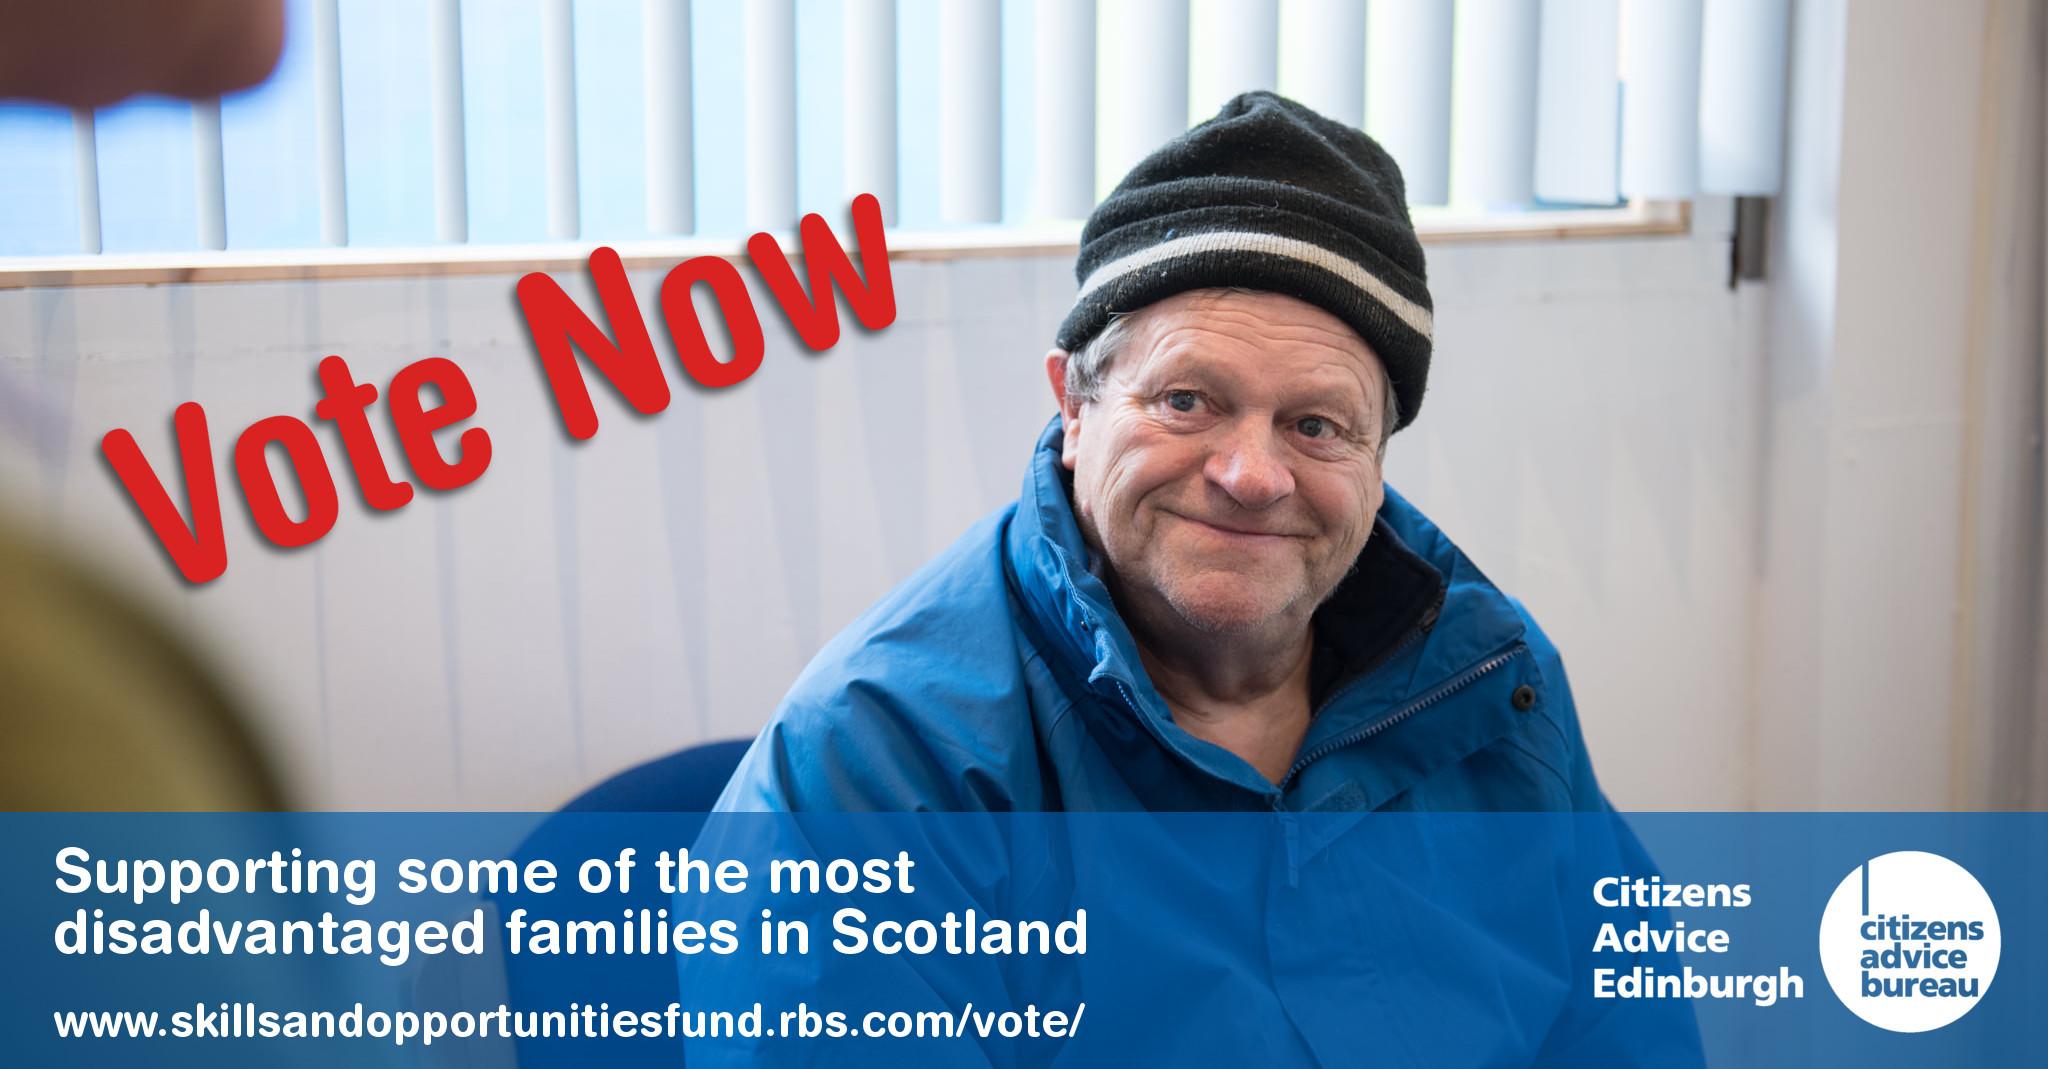 Citizens Advice Edinburgh RBS Fund